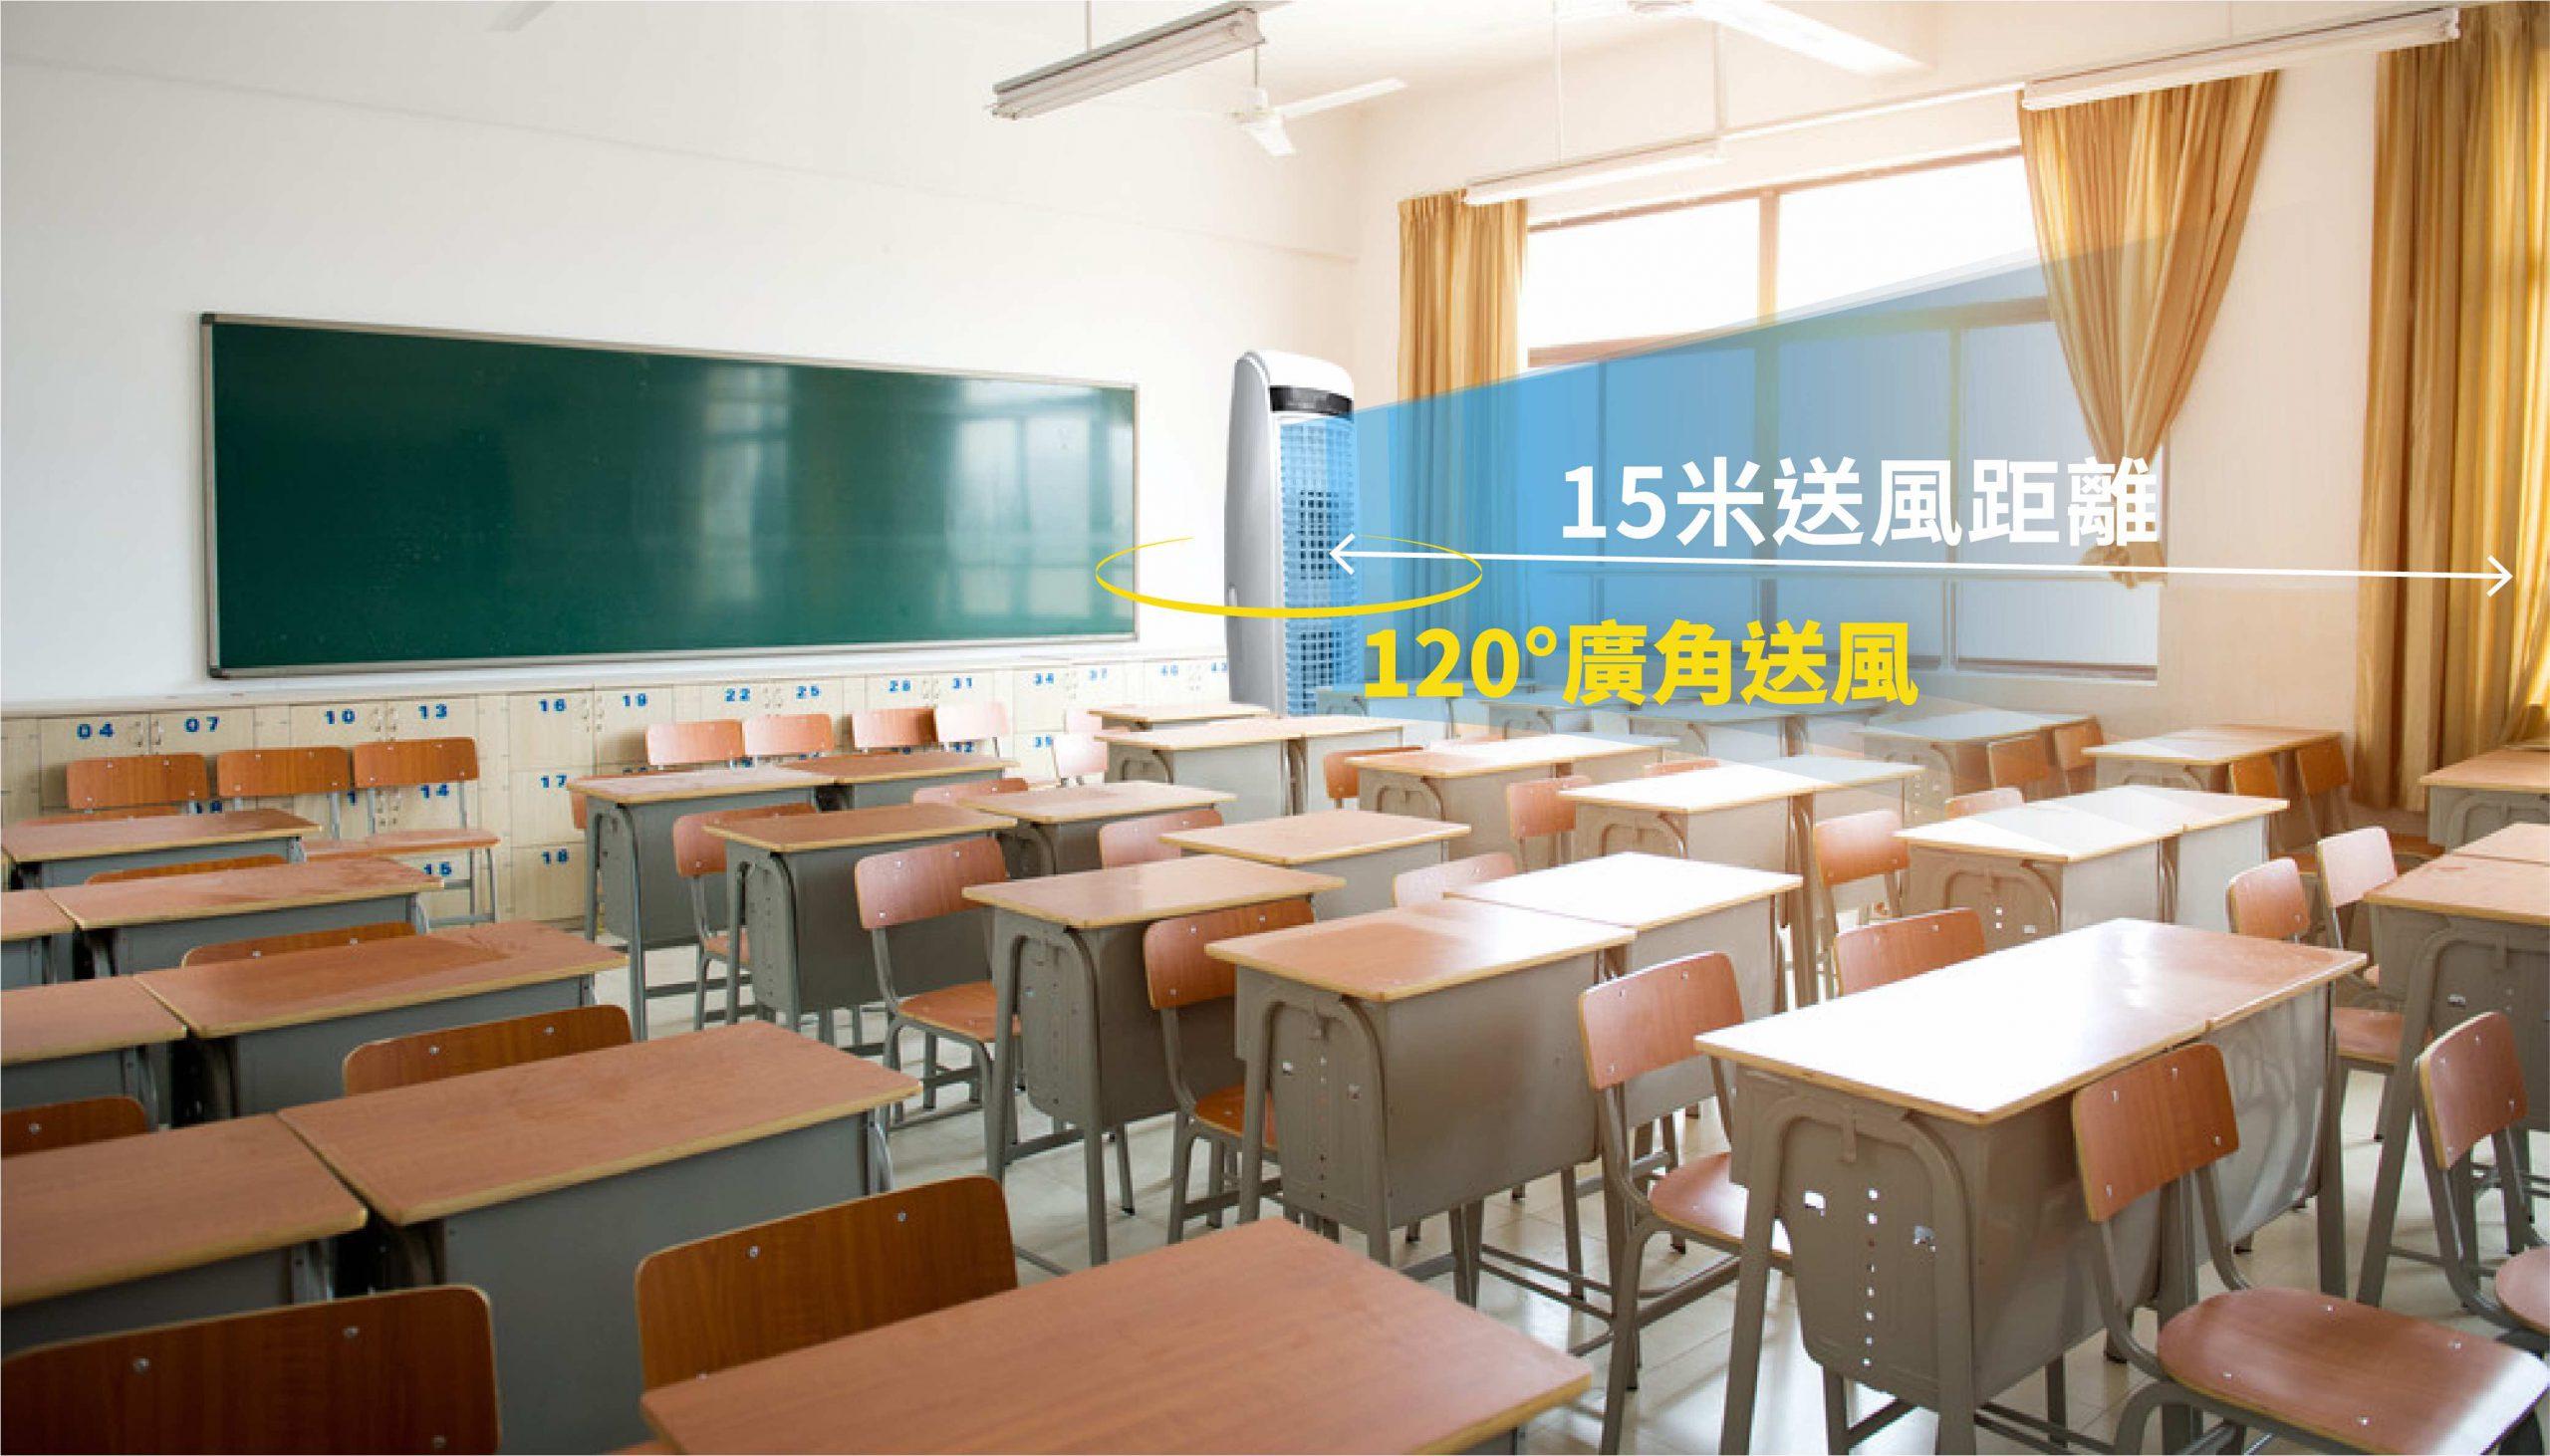 school-mockup